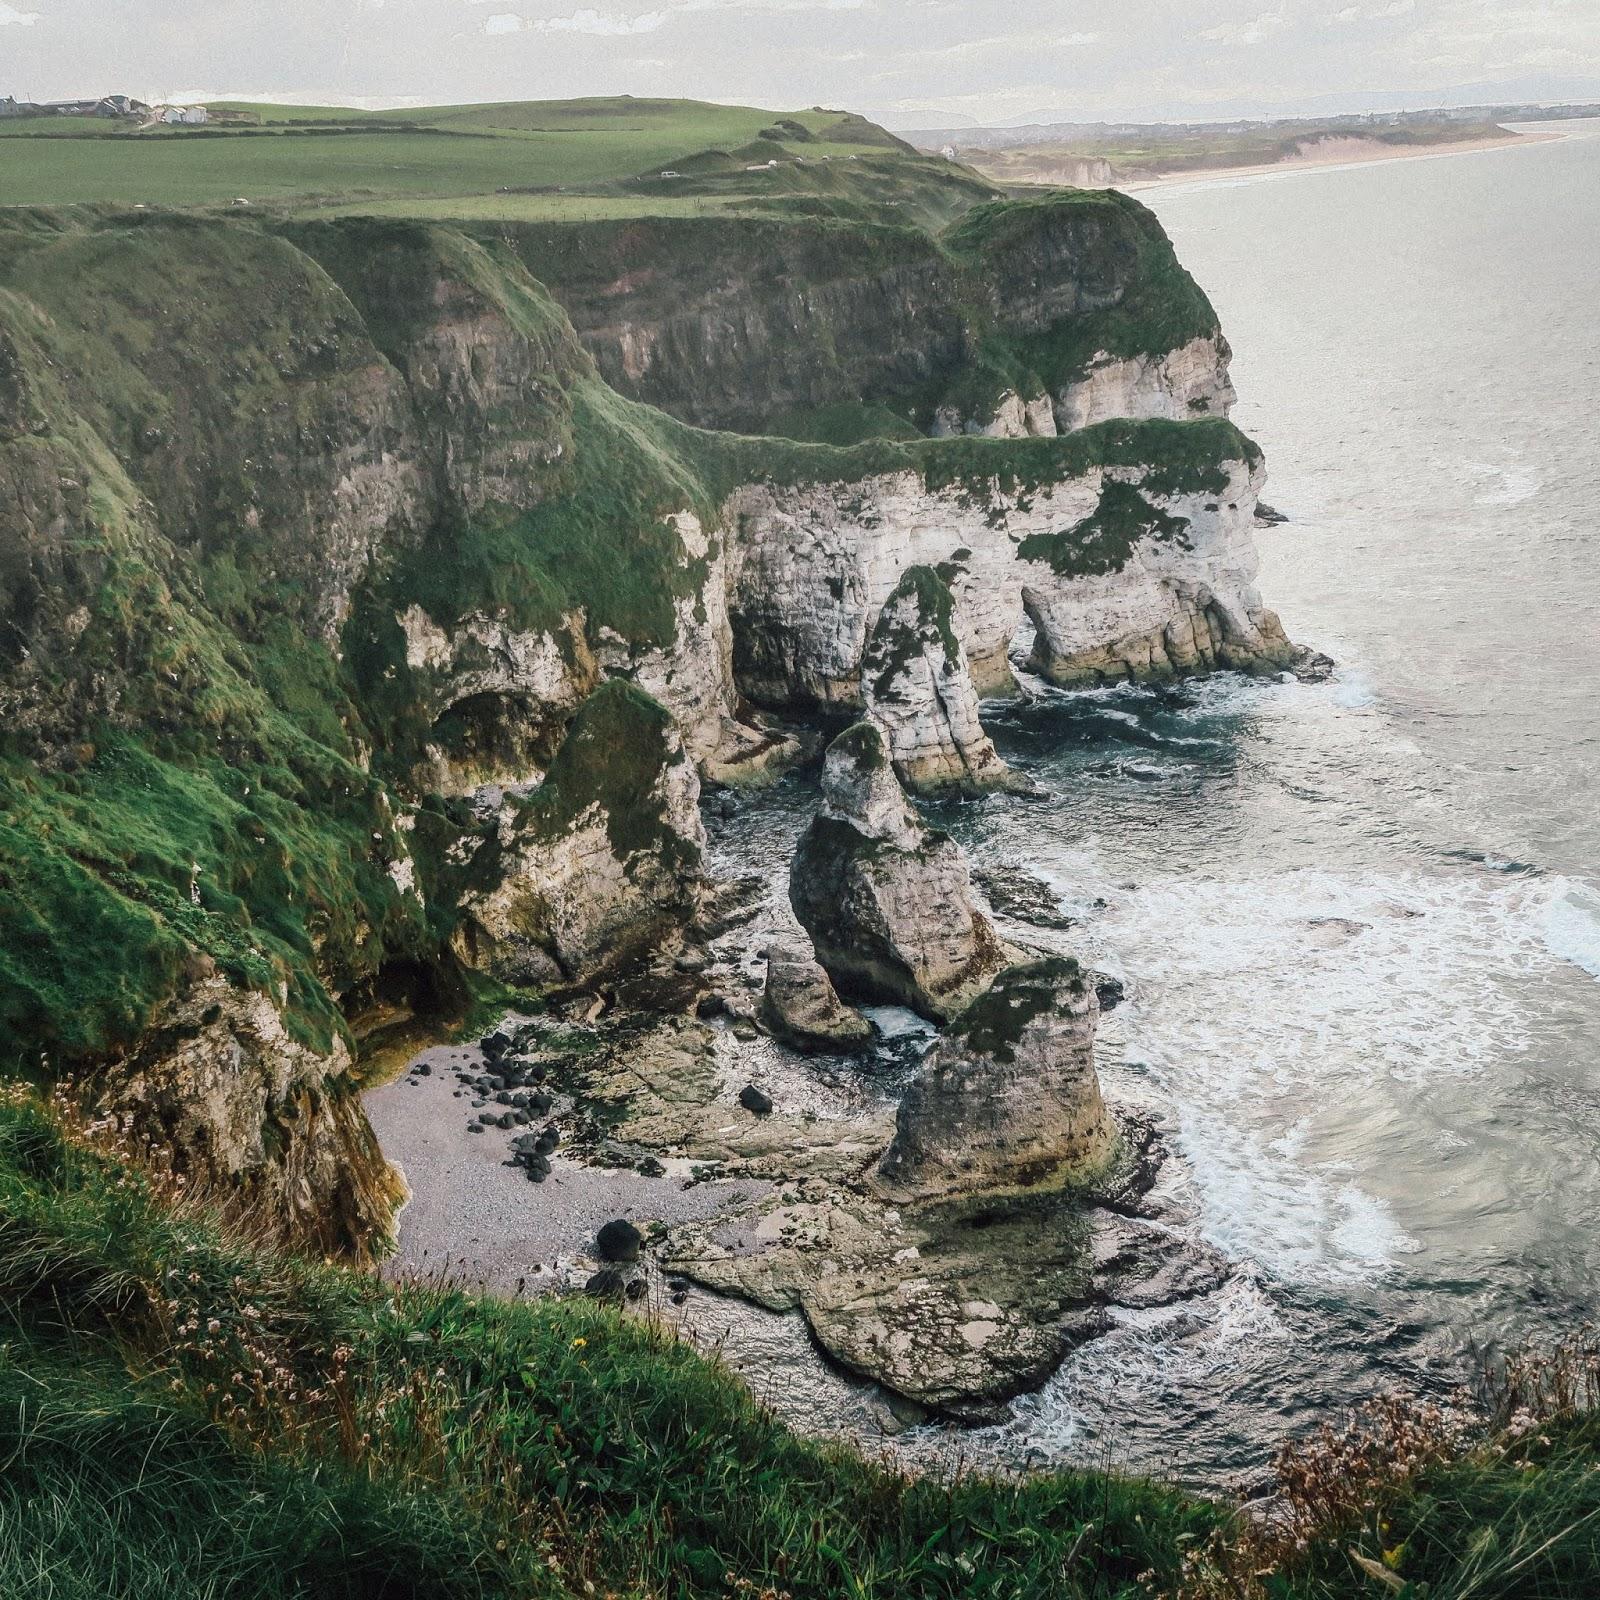 northern ireland coast rocks irish sea waves liquidgrain liquid grain